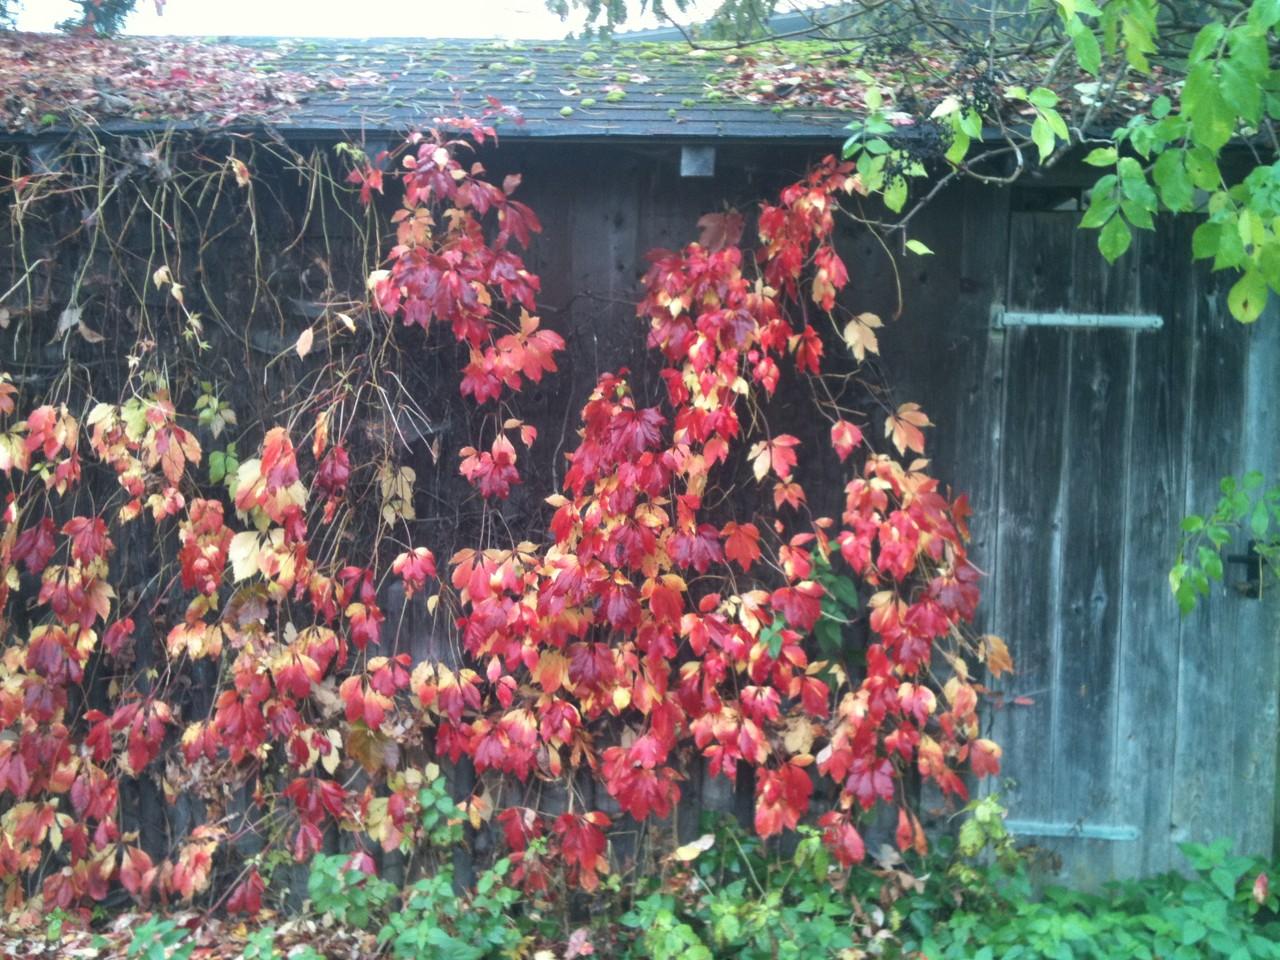 Herbstlaub - Fotos/Copyright: Franz Lutje